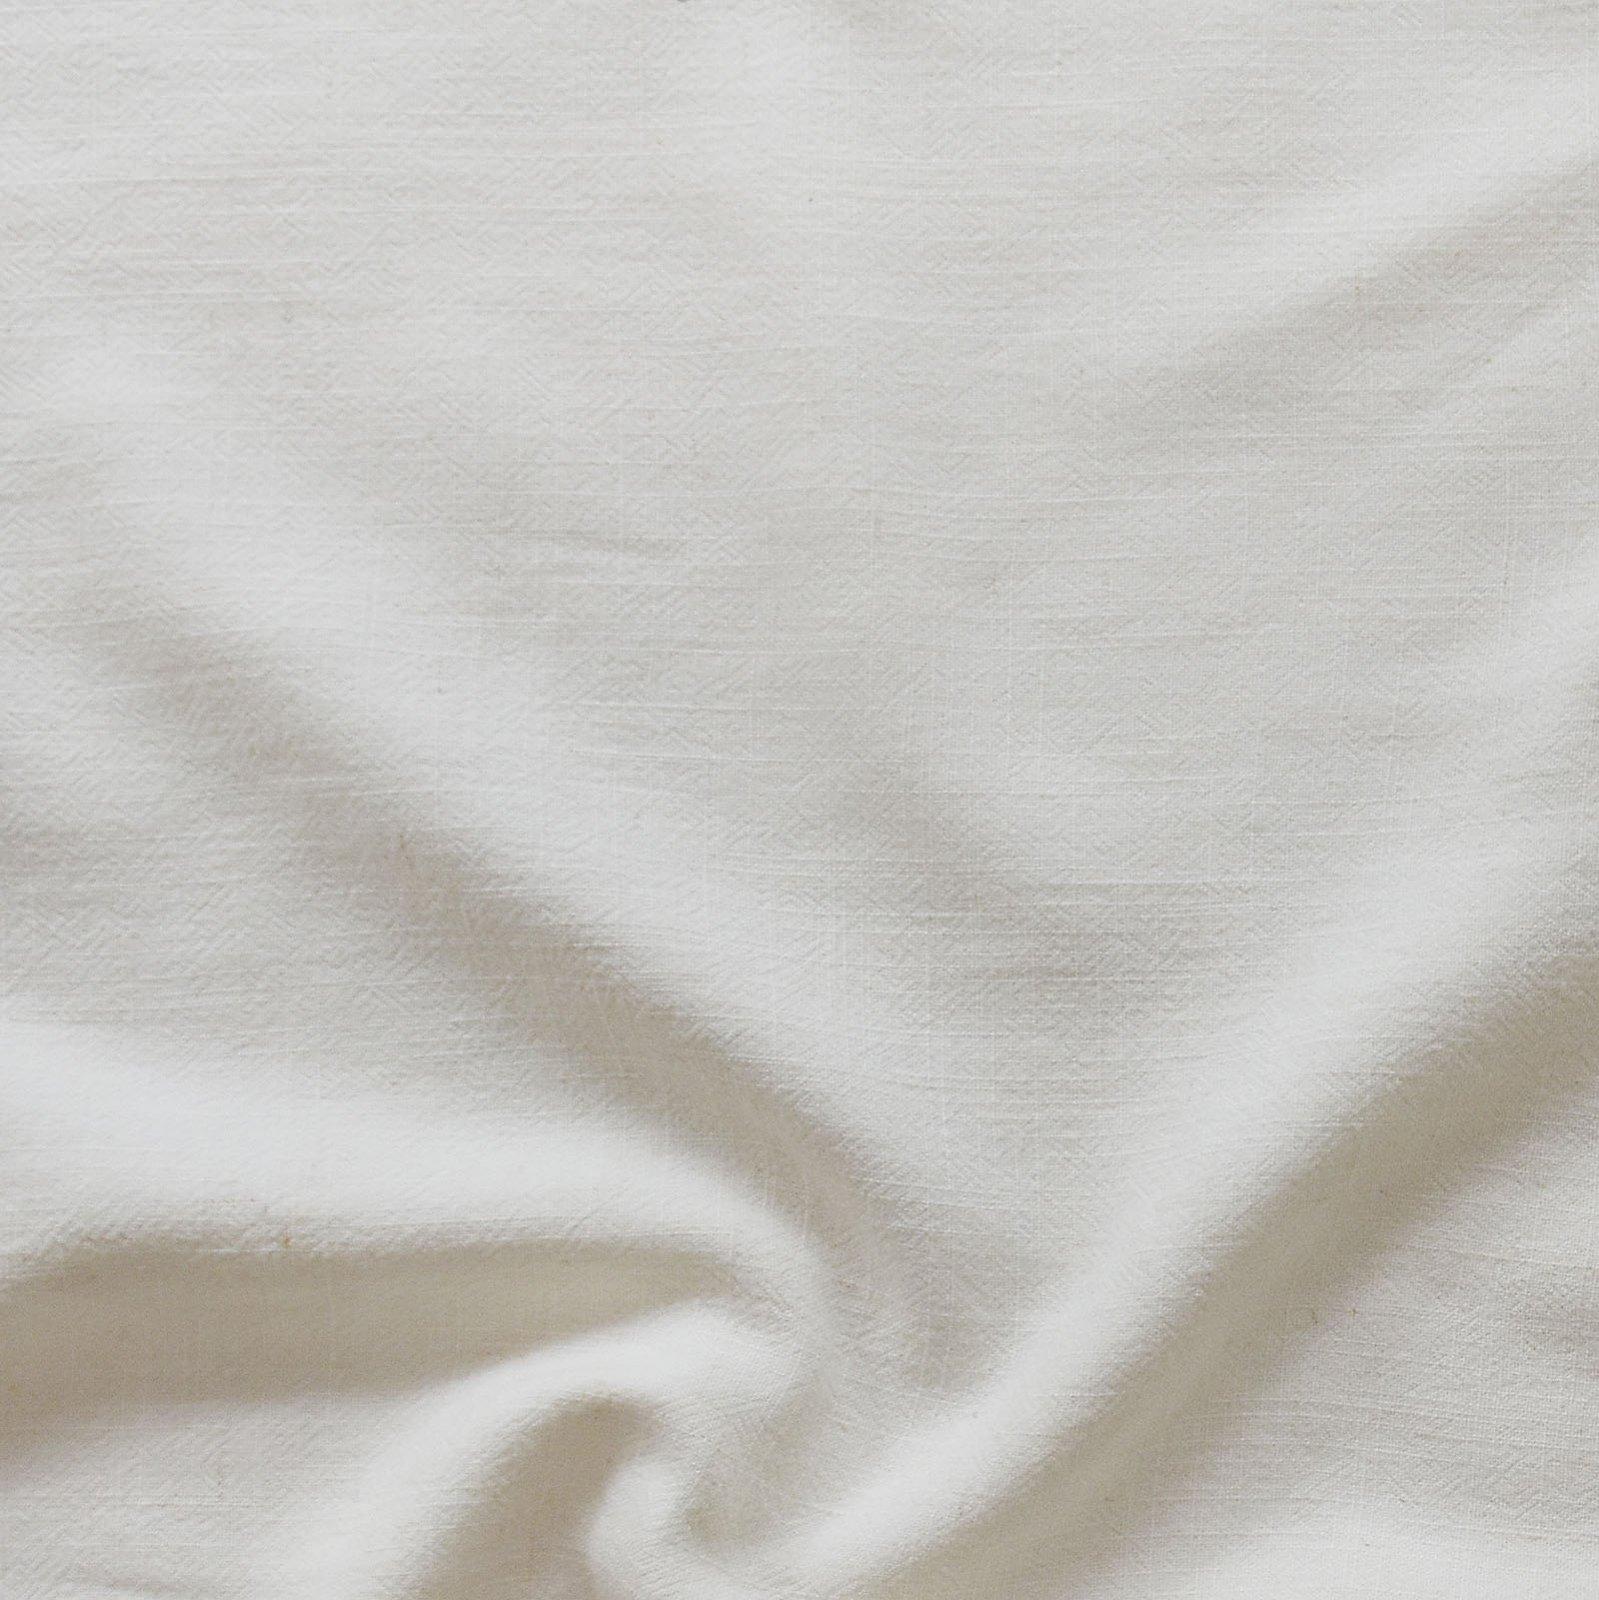 Grace Viscose & Linen Blend - Off White